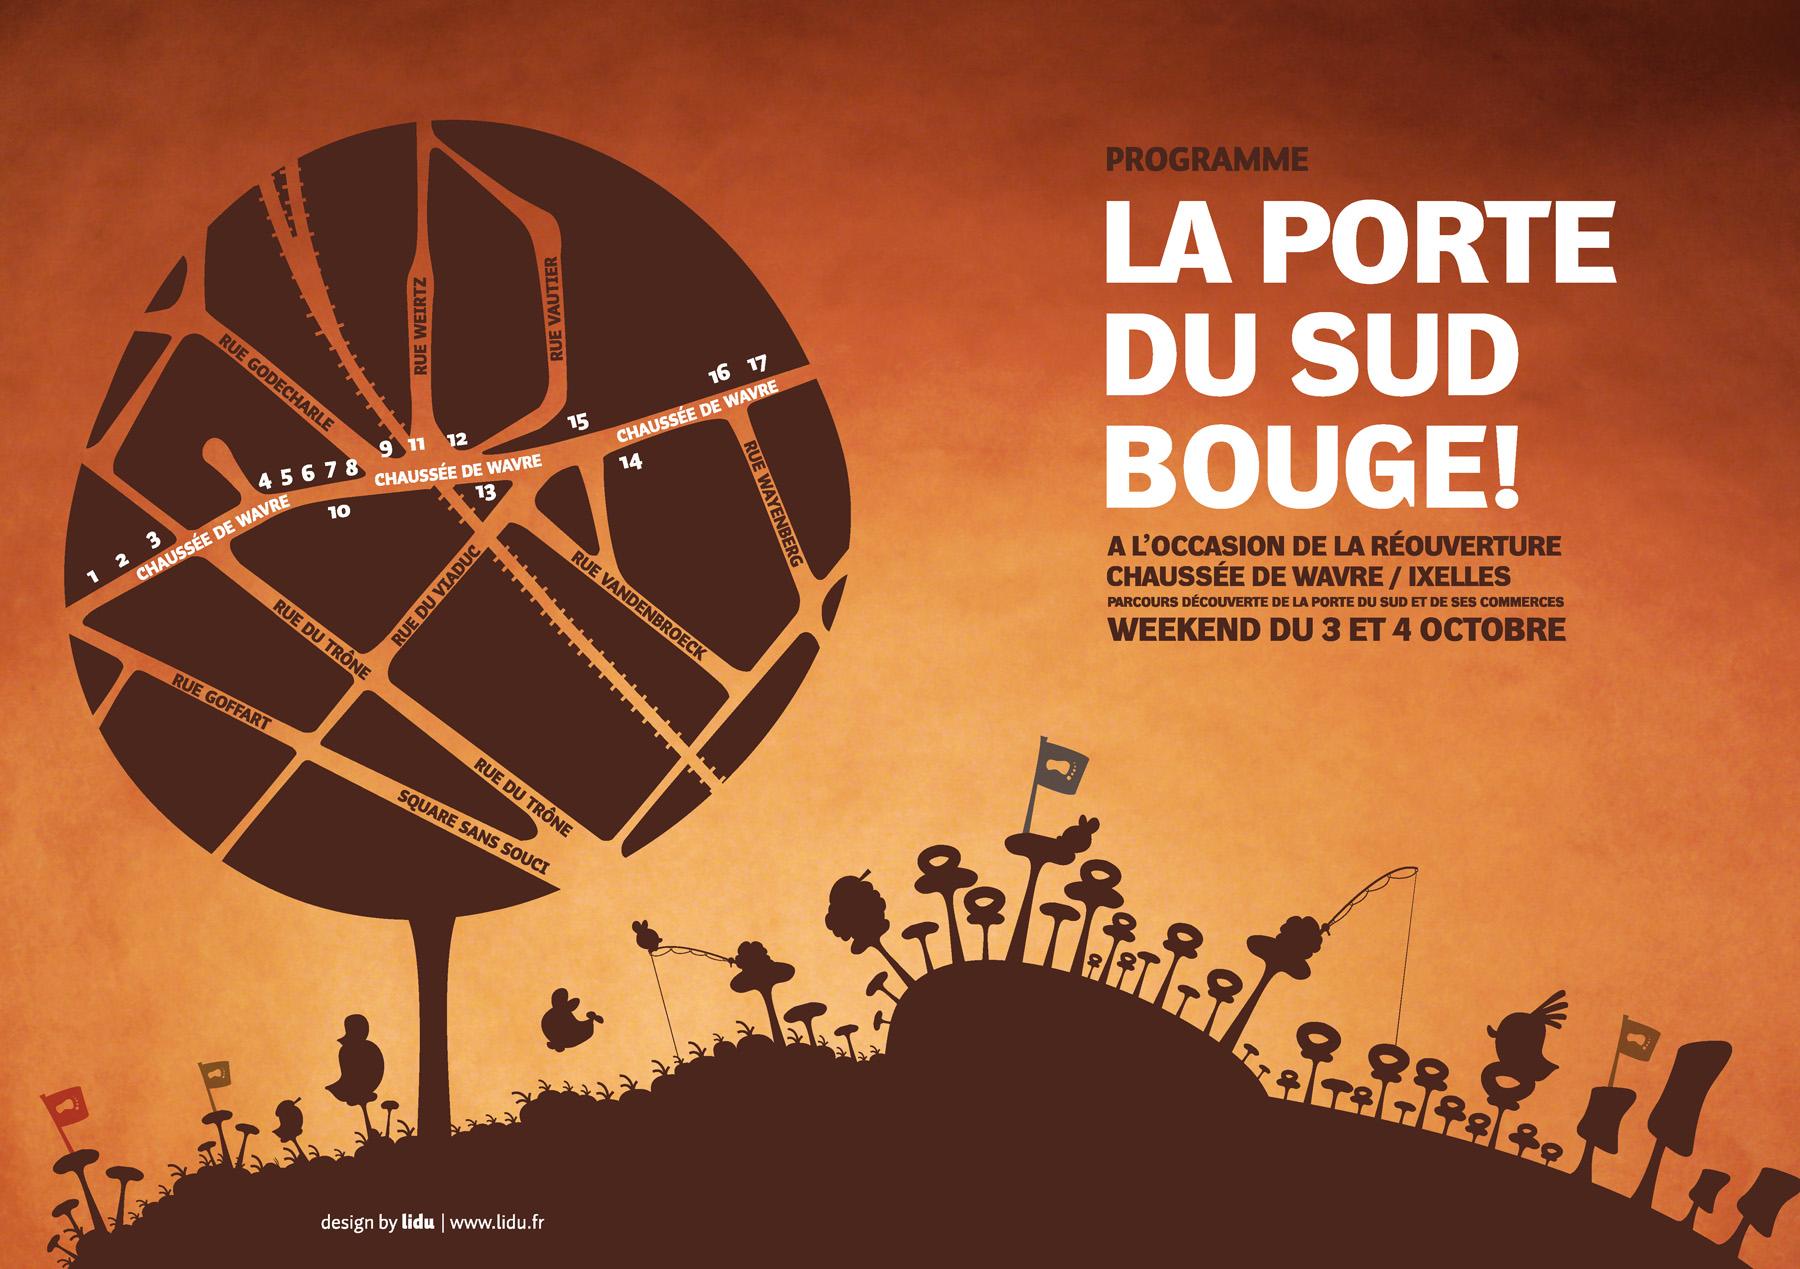 Porte_du_Sud_plan.jpg